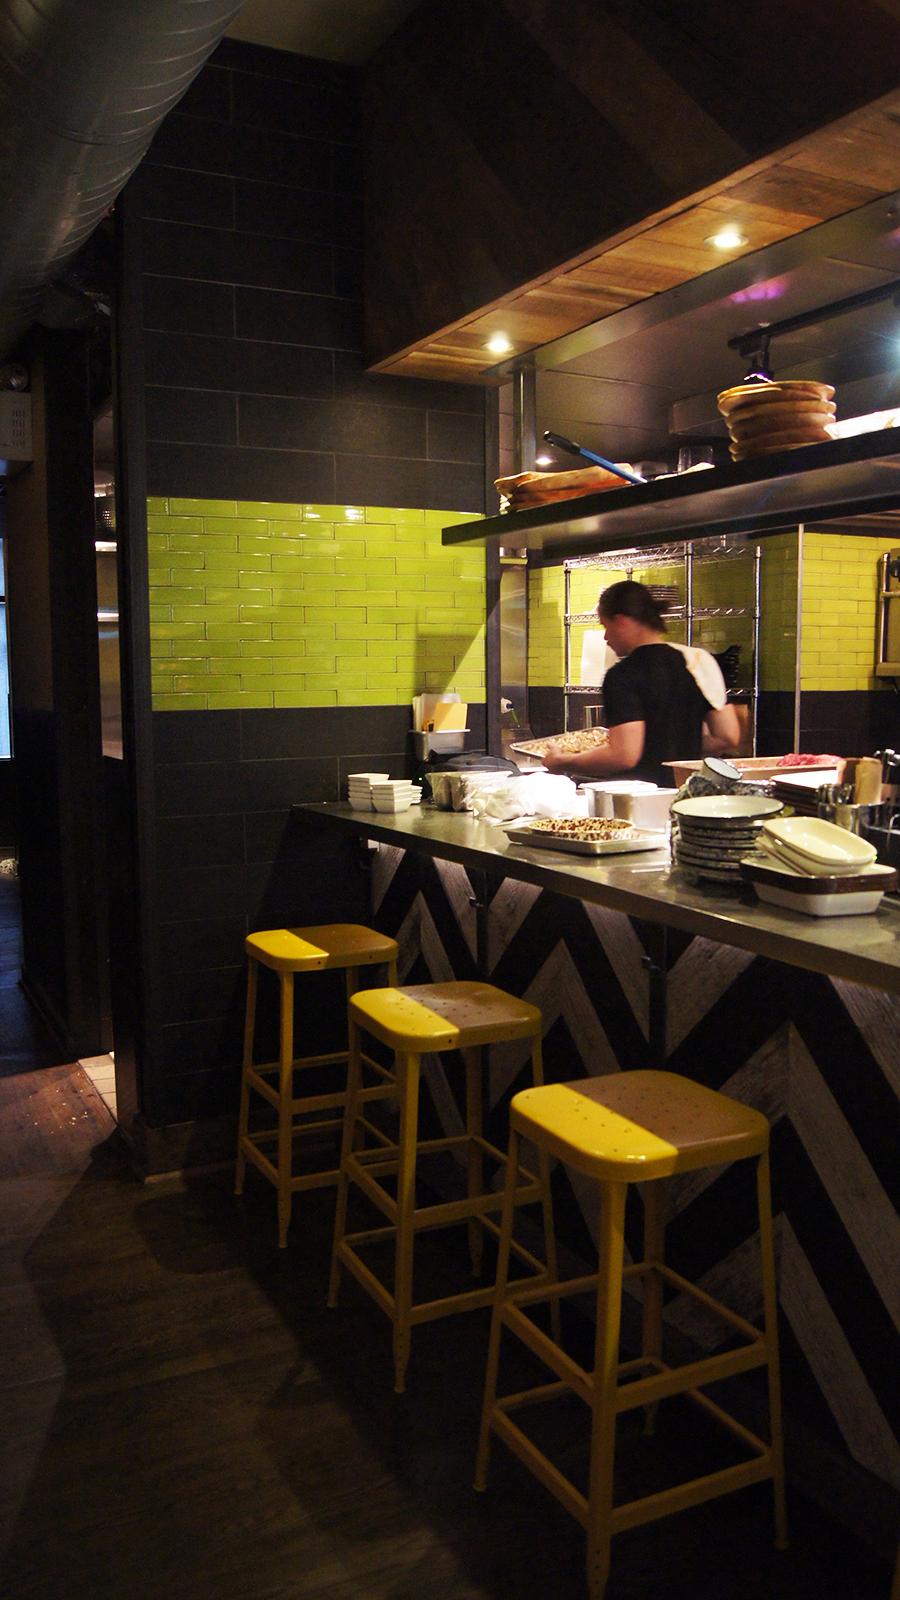 Lolita-Kitchen Bar with Stools-01.jpg